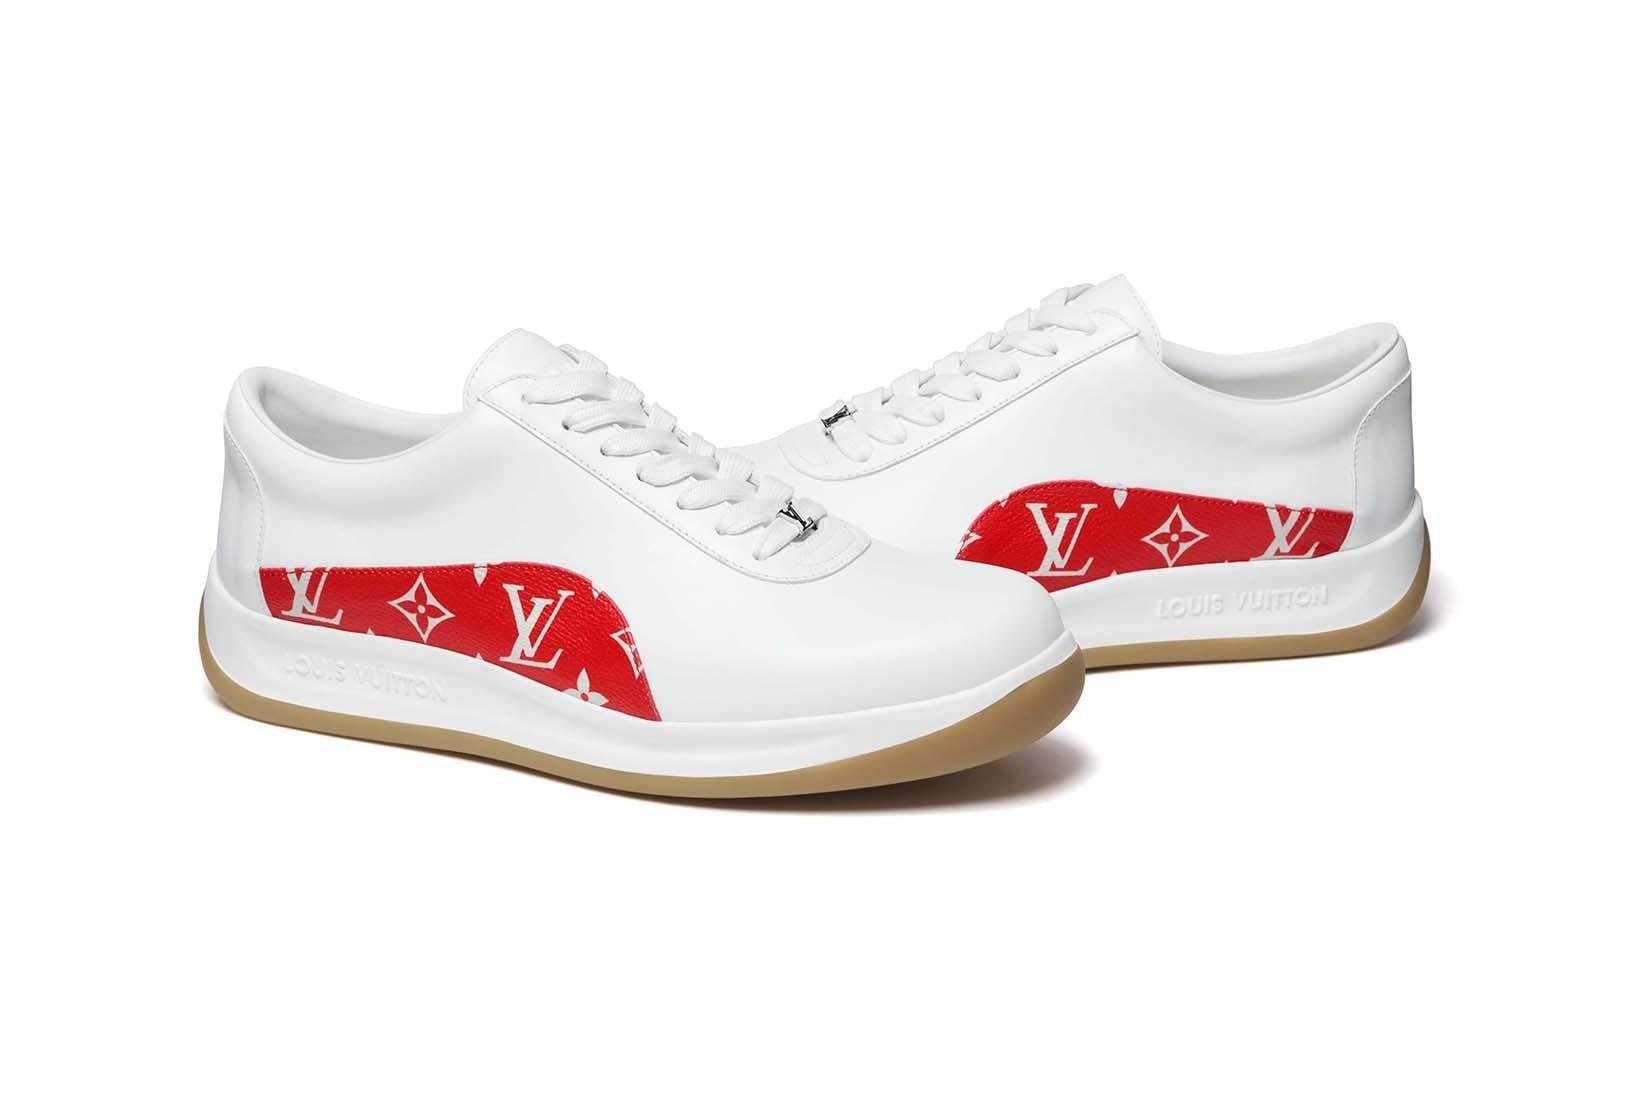 Supreme(シュプリーム)×Louis Vuitton(ルイ・ヴィトン) / スポーツ スニーカー(Sport Sneaker)